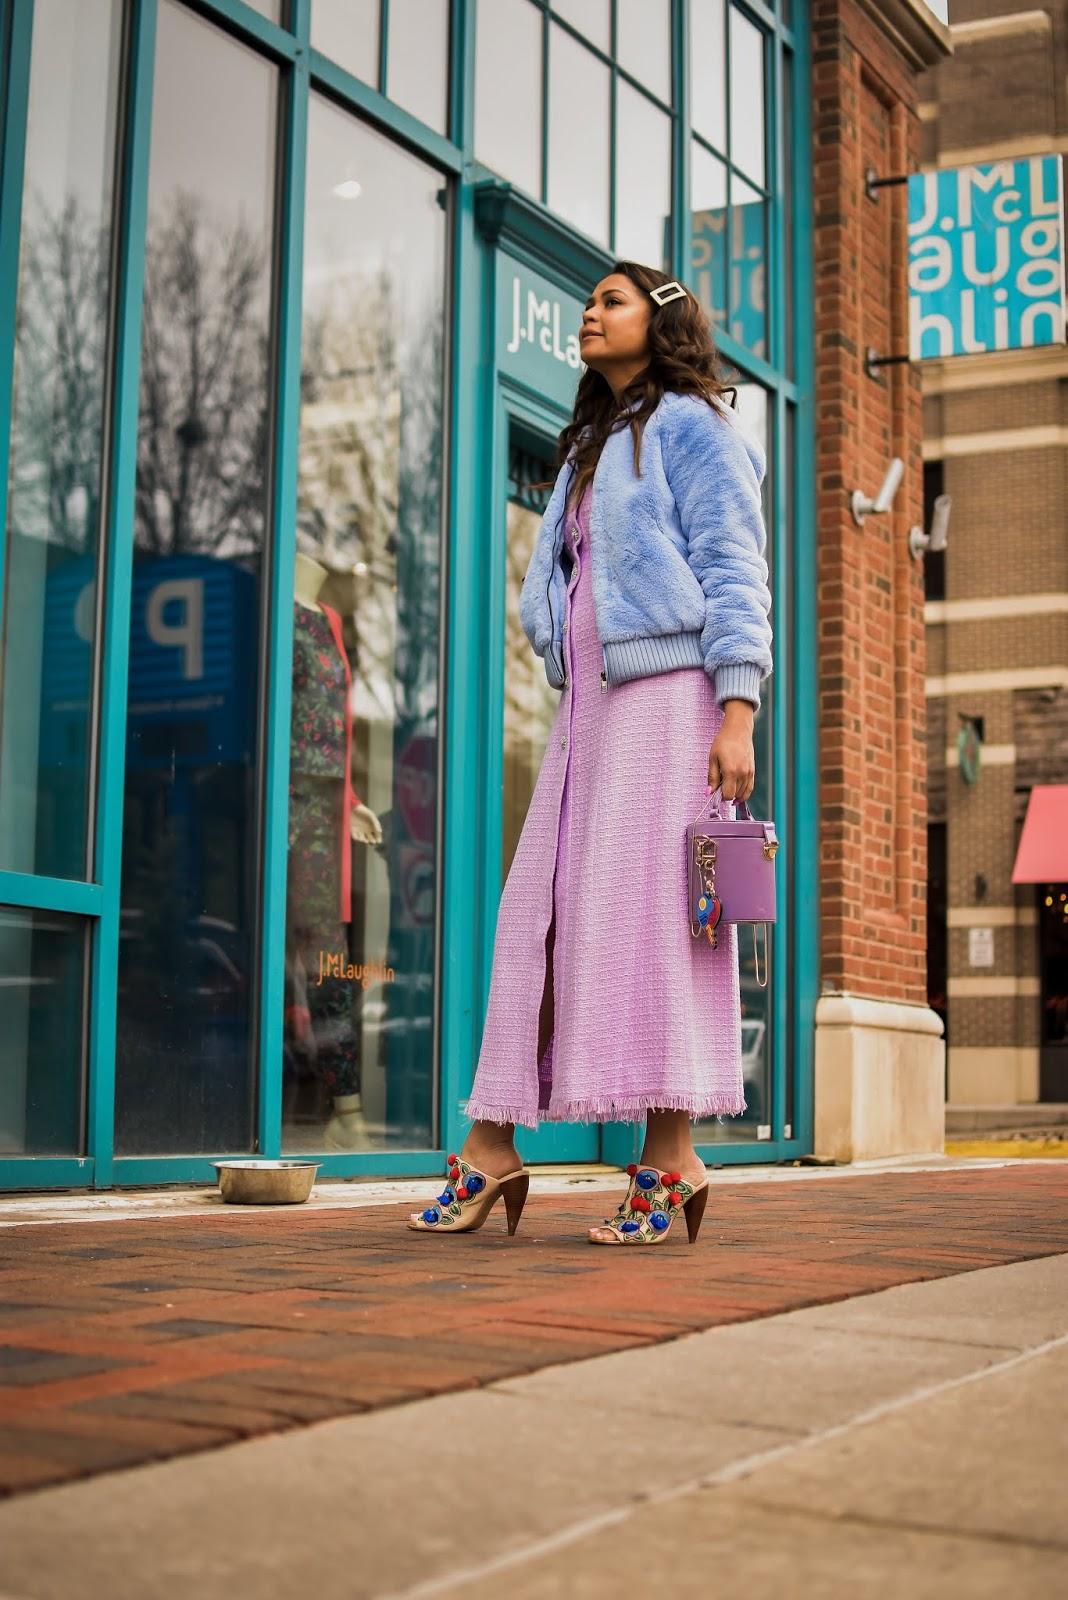 lilac zara dress, blue fur coat, DC blogger, tweed dress, tory burch pom pom mules, street style, drum bag, purple satin bag, barrel bag, myriad musings, saumya shiohare